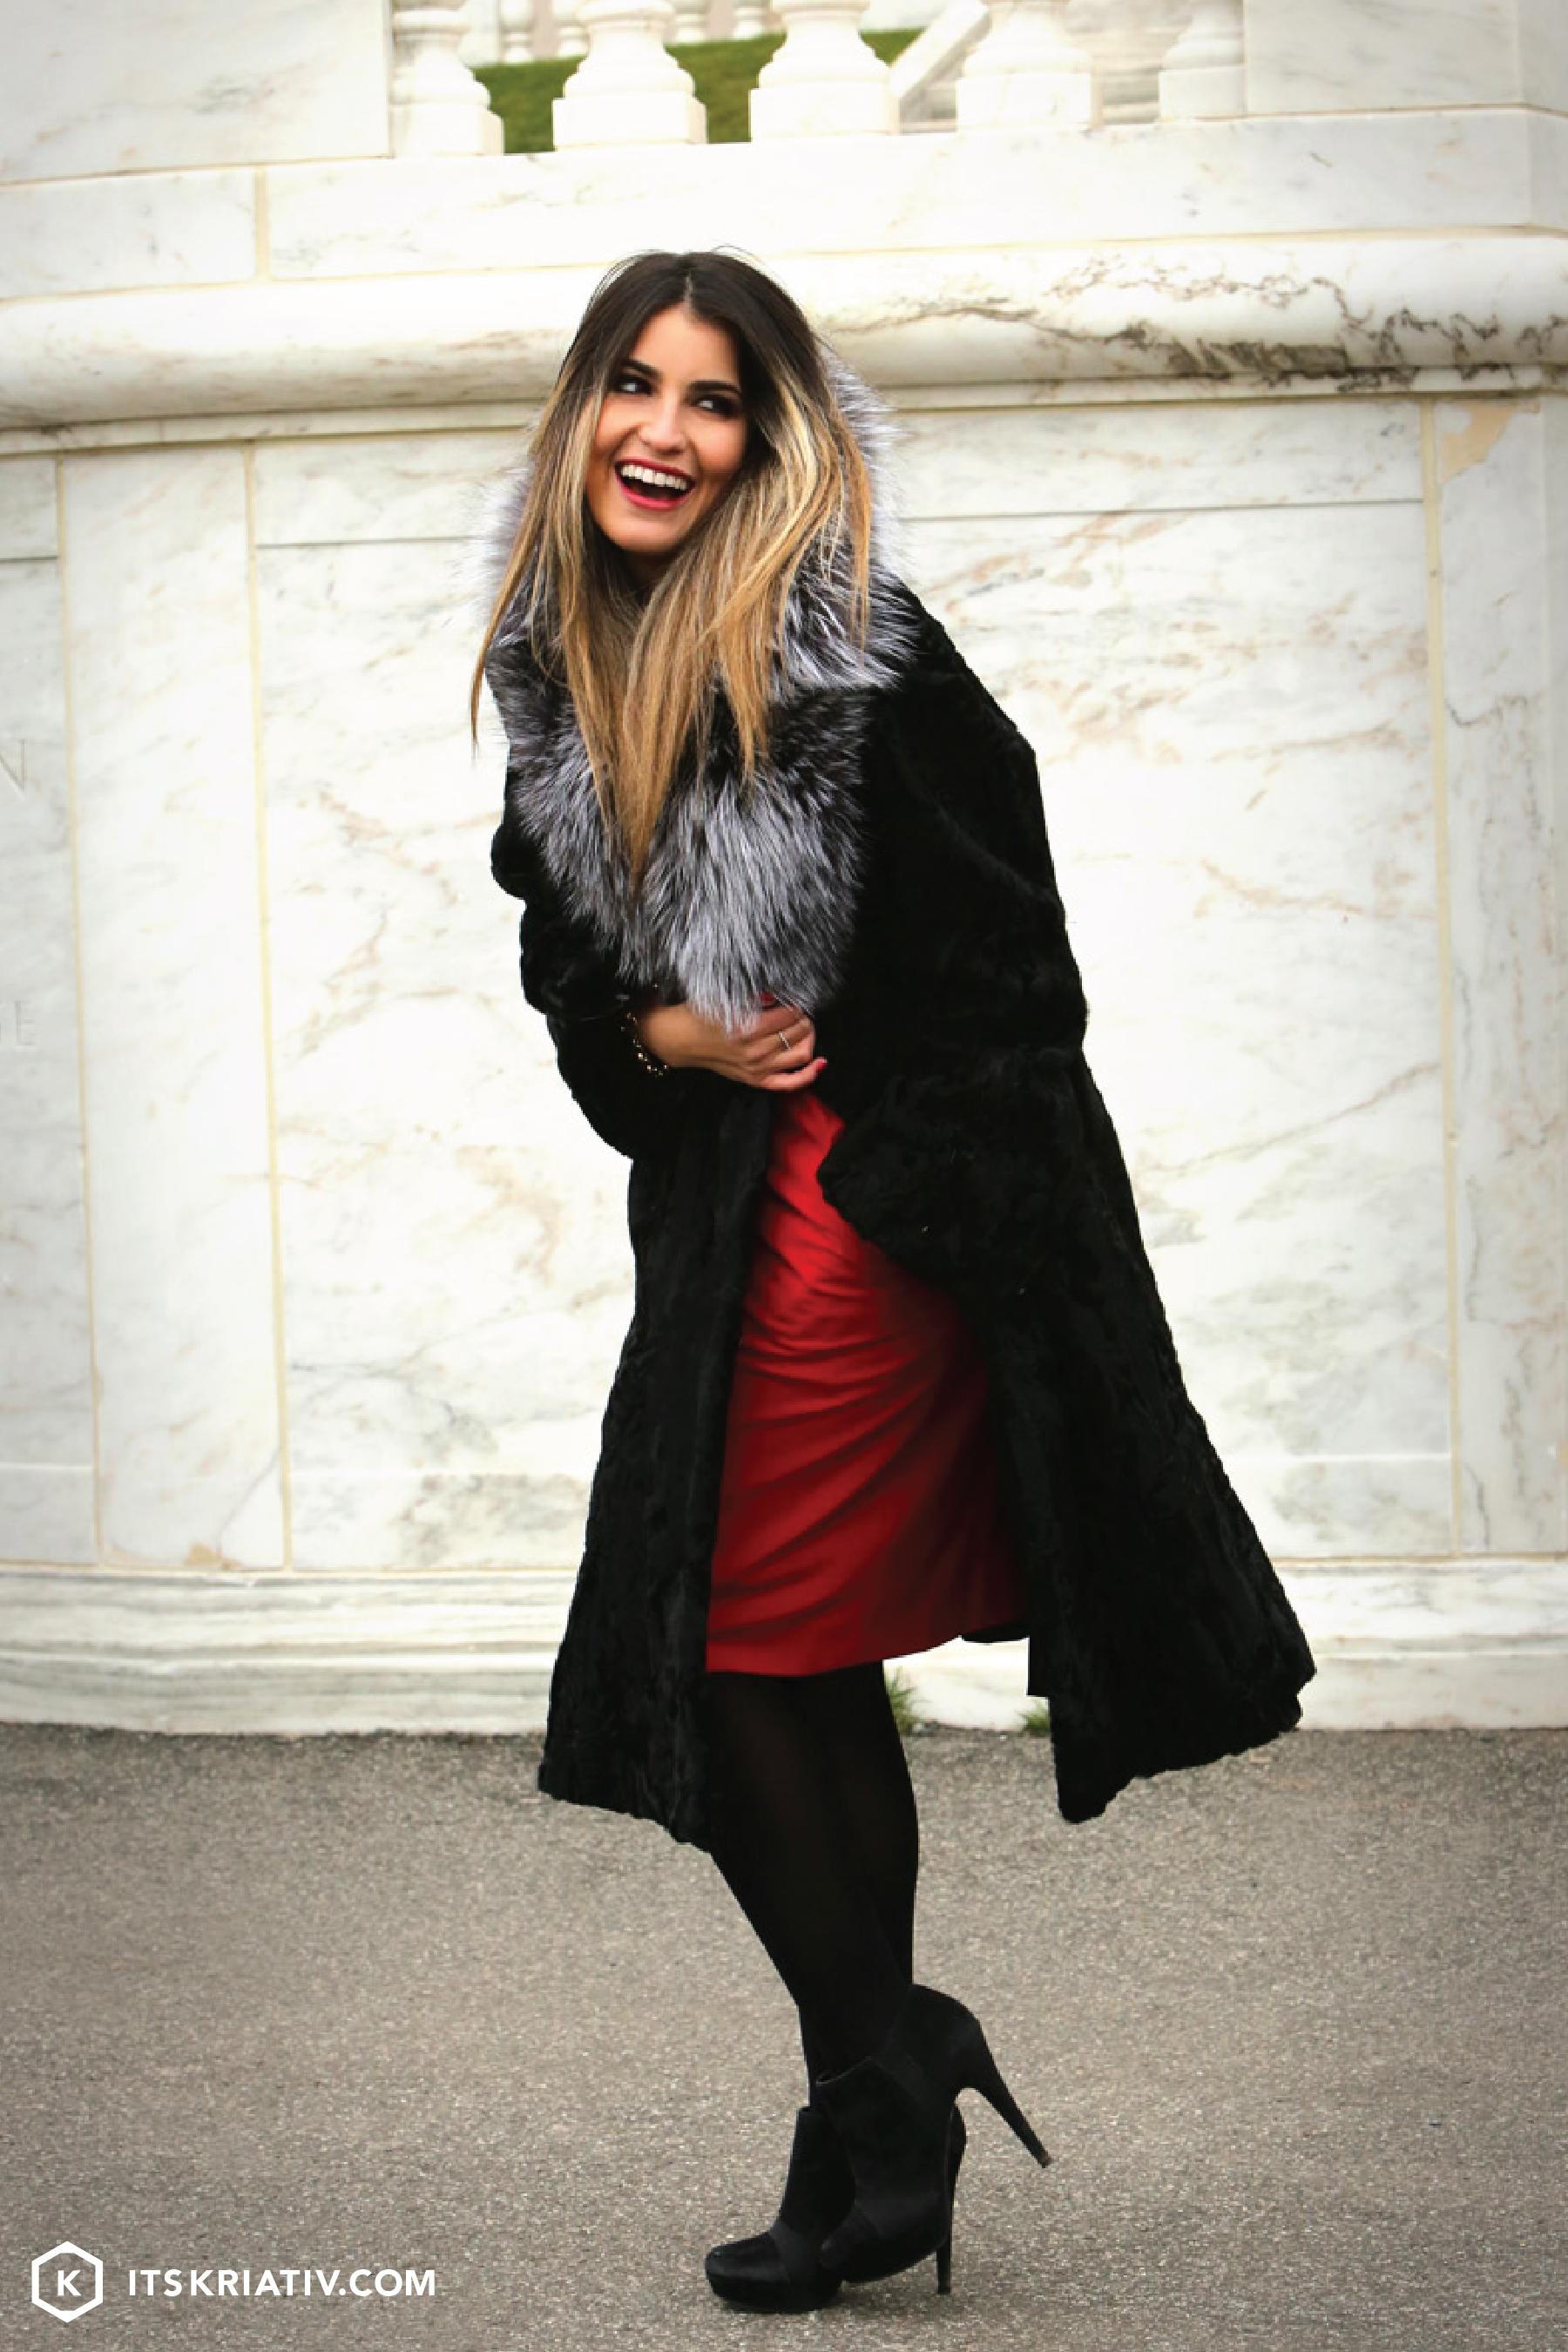 ItsKriativ_Fashion_Fur_Real-07.jpg